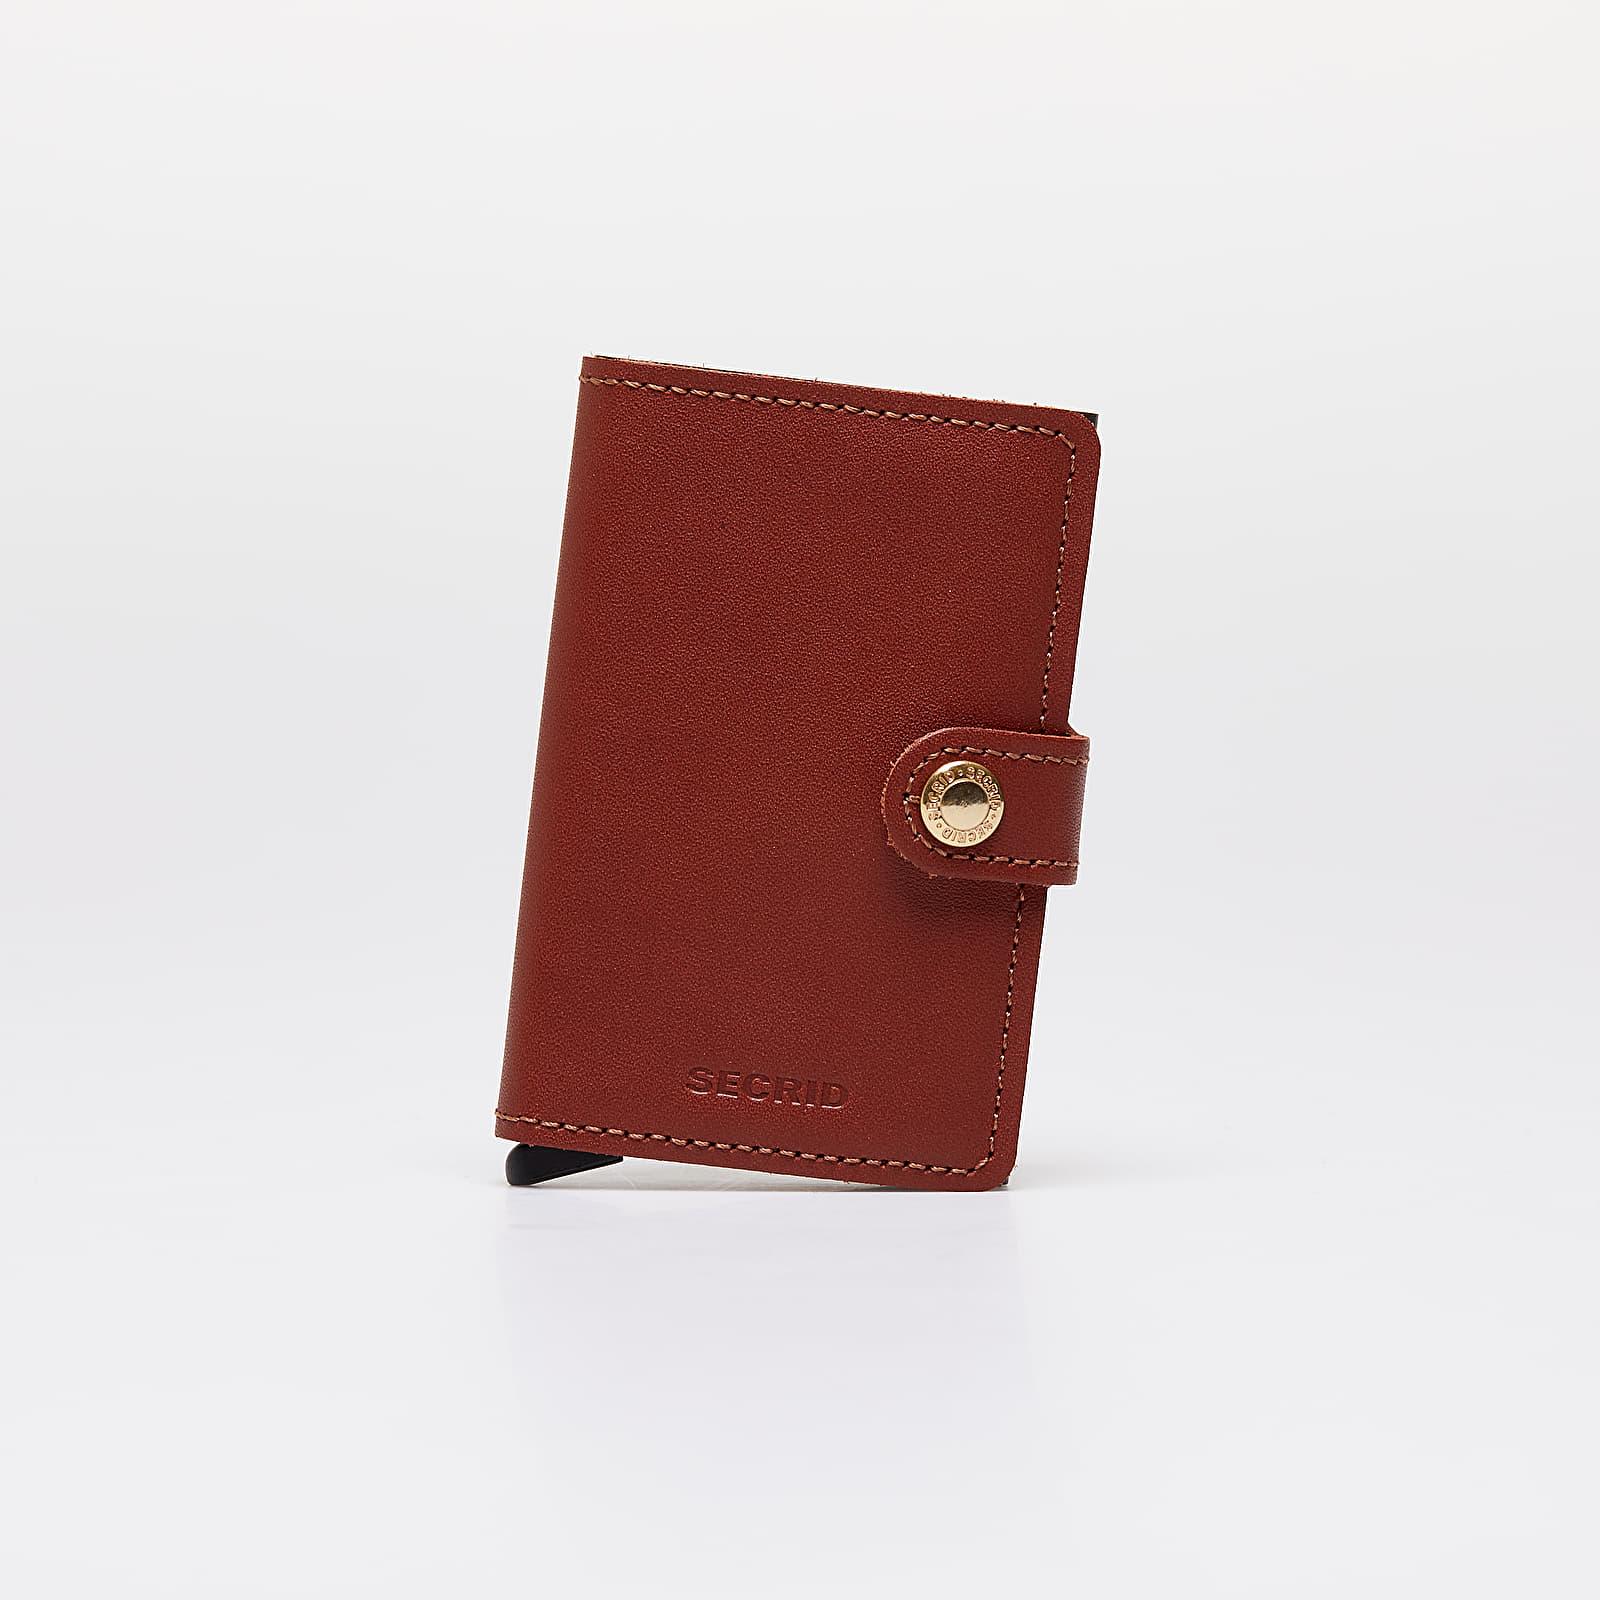 Portemonnaies Secrid Miniwallet Original Cognac-Brown